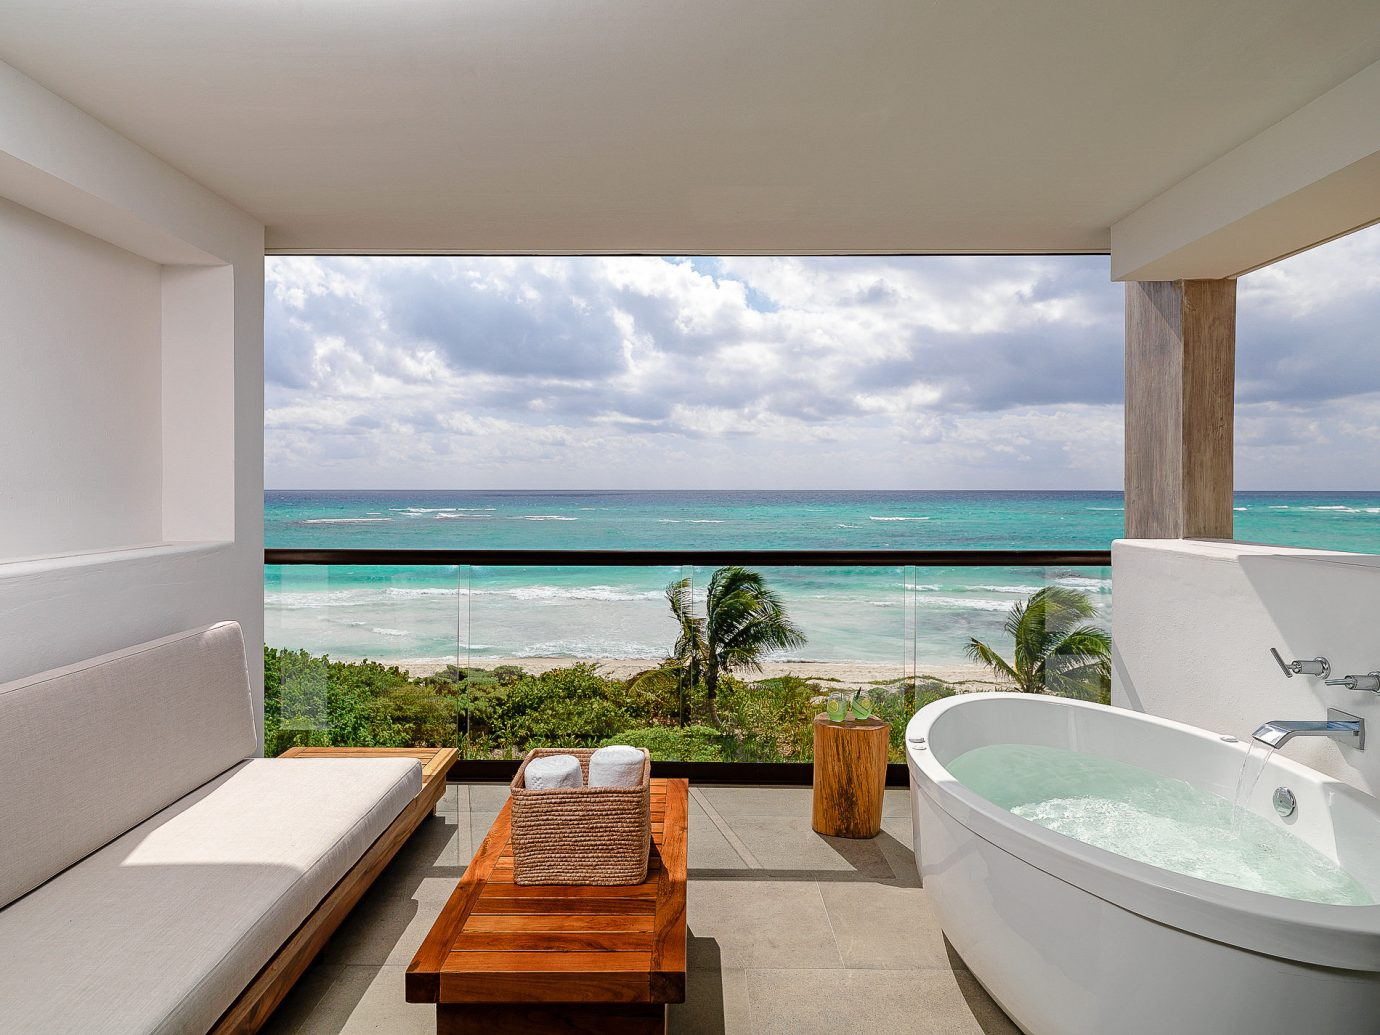 Boutique Hotels Hotels Luxury Travel property Sea swimming pool Resort bathtub sky Ocean Villa condominium amenity penthouse apartment house overlooking Island